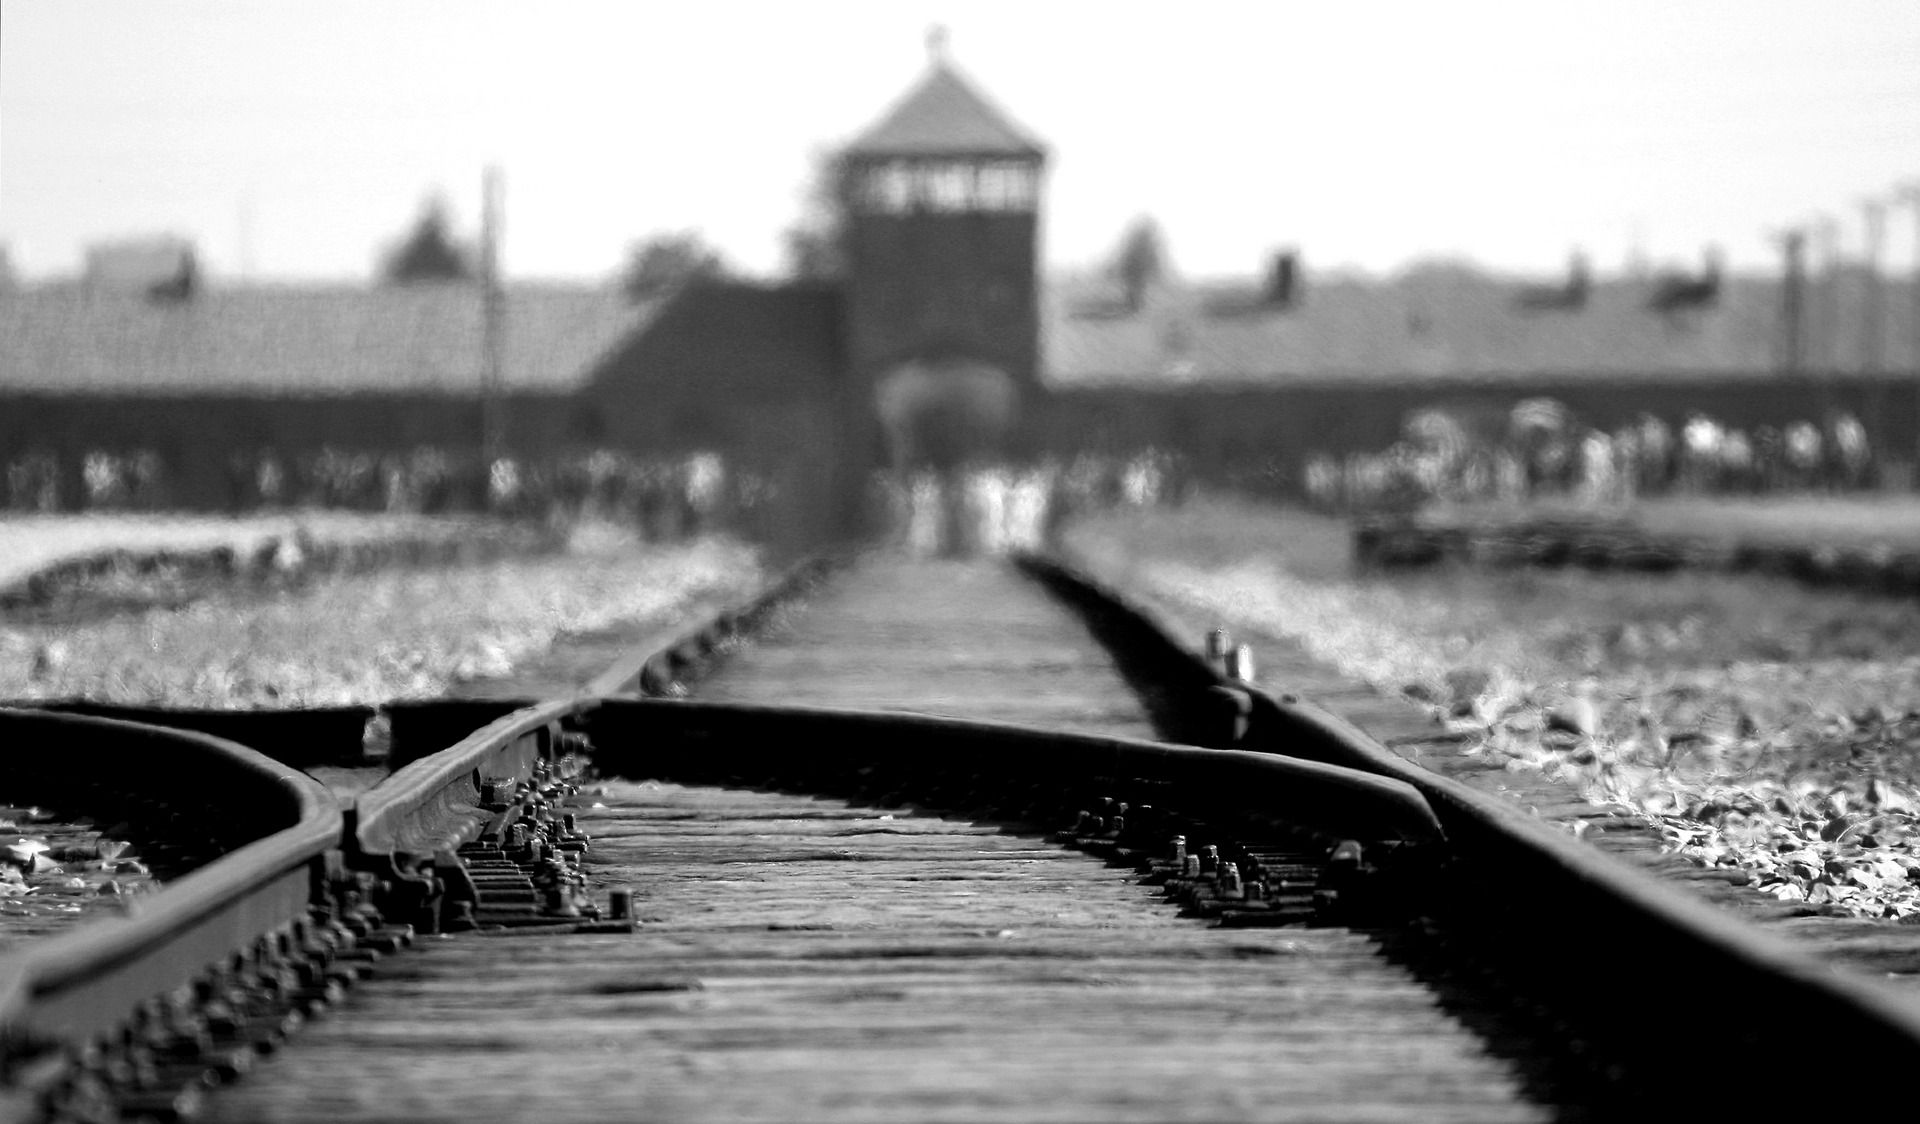 FELJTON Kako je počelo zlo Holokausta